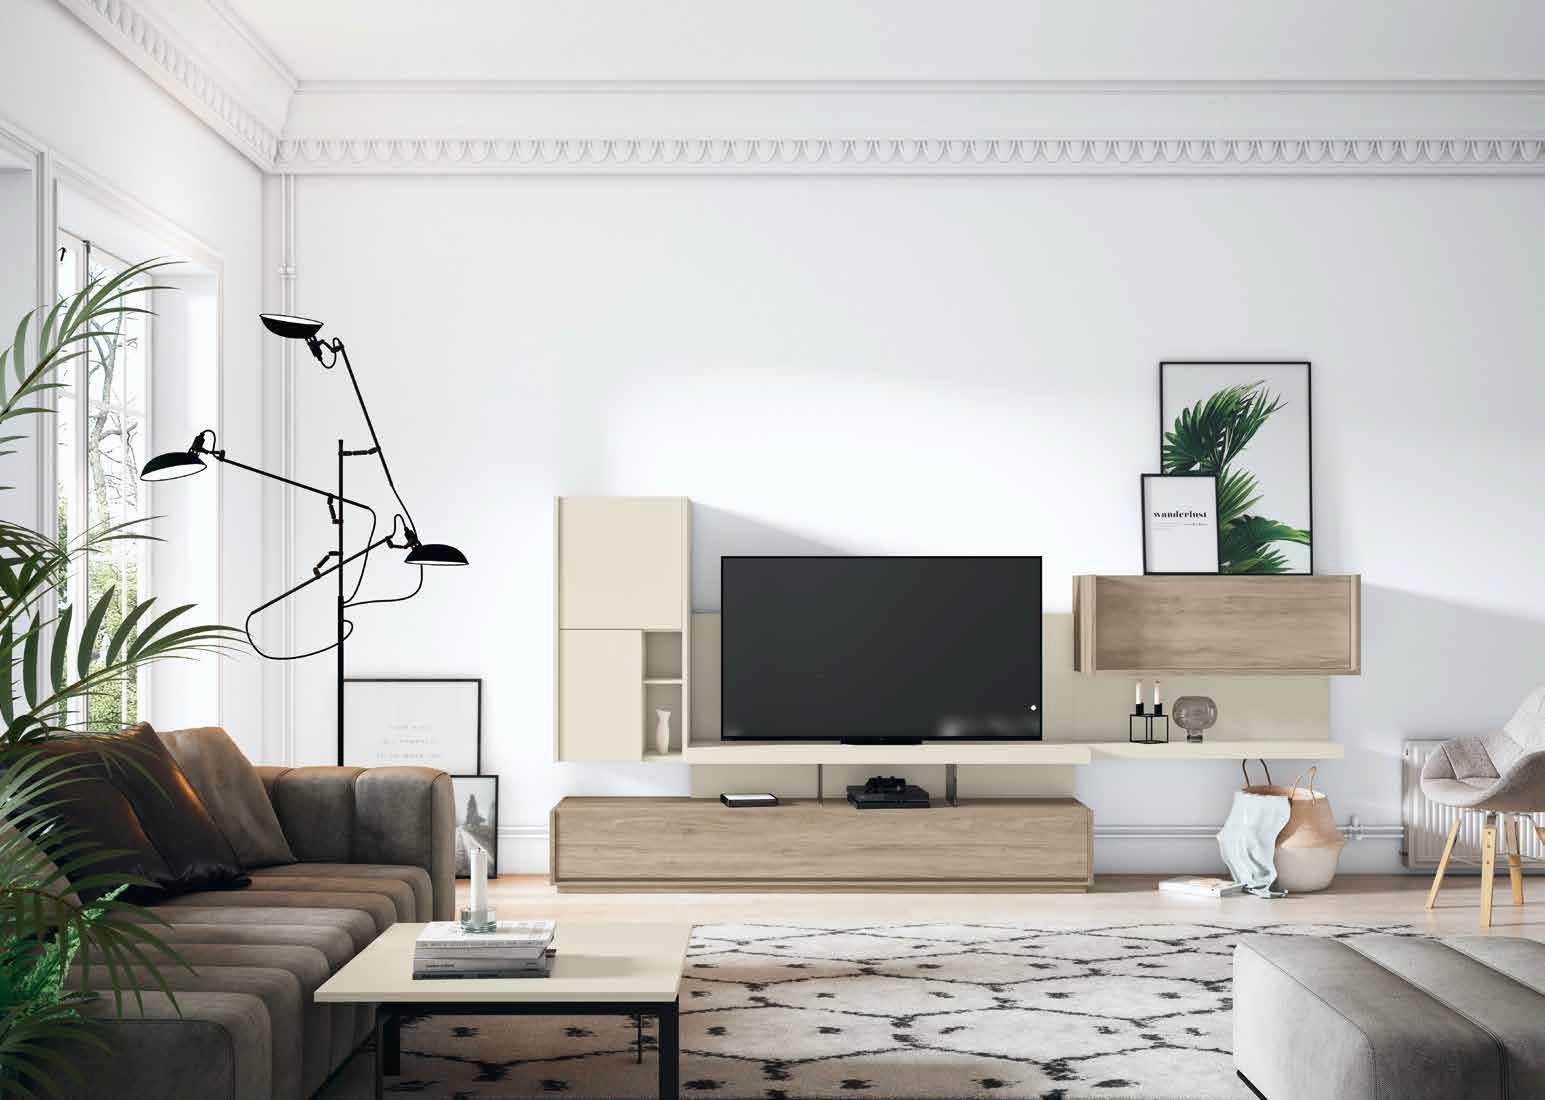 salon-moderno-Nativ-2019-muebles-paco-caballero-0920-5c8cea91eb283